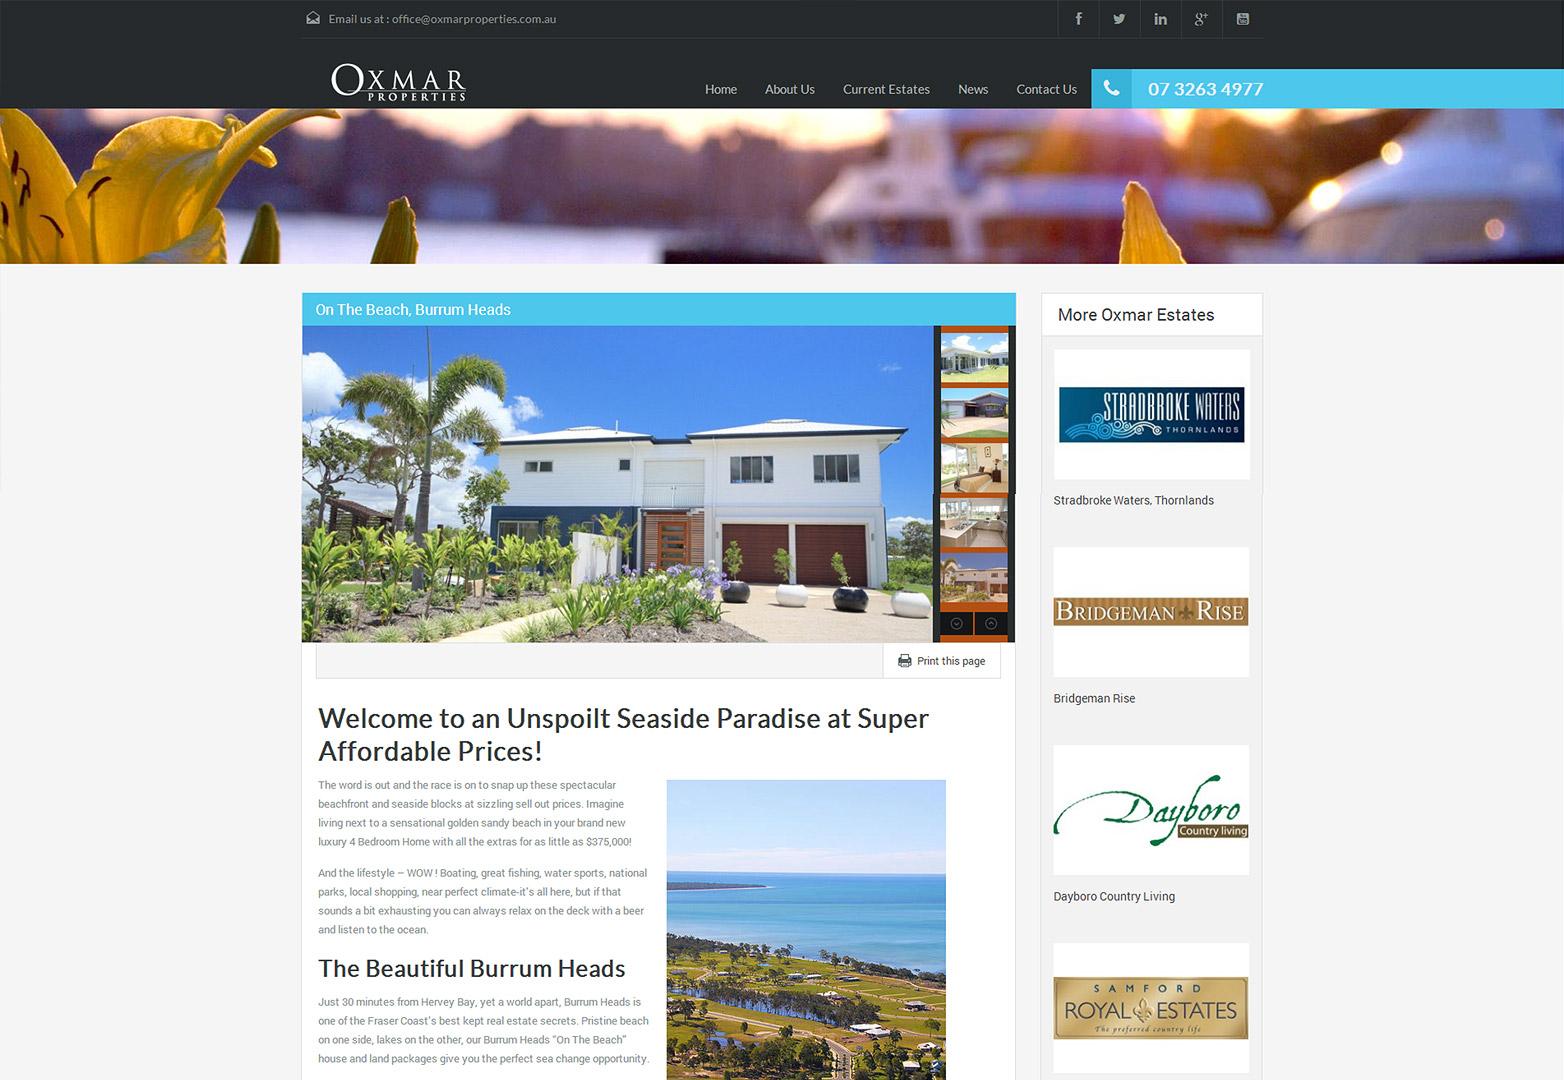 Oxmar listing page